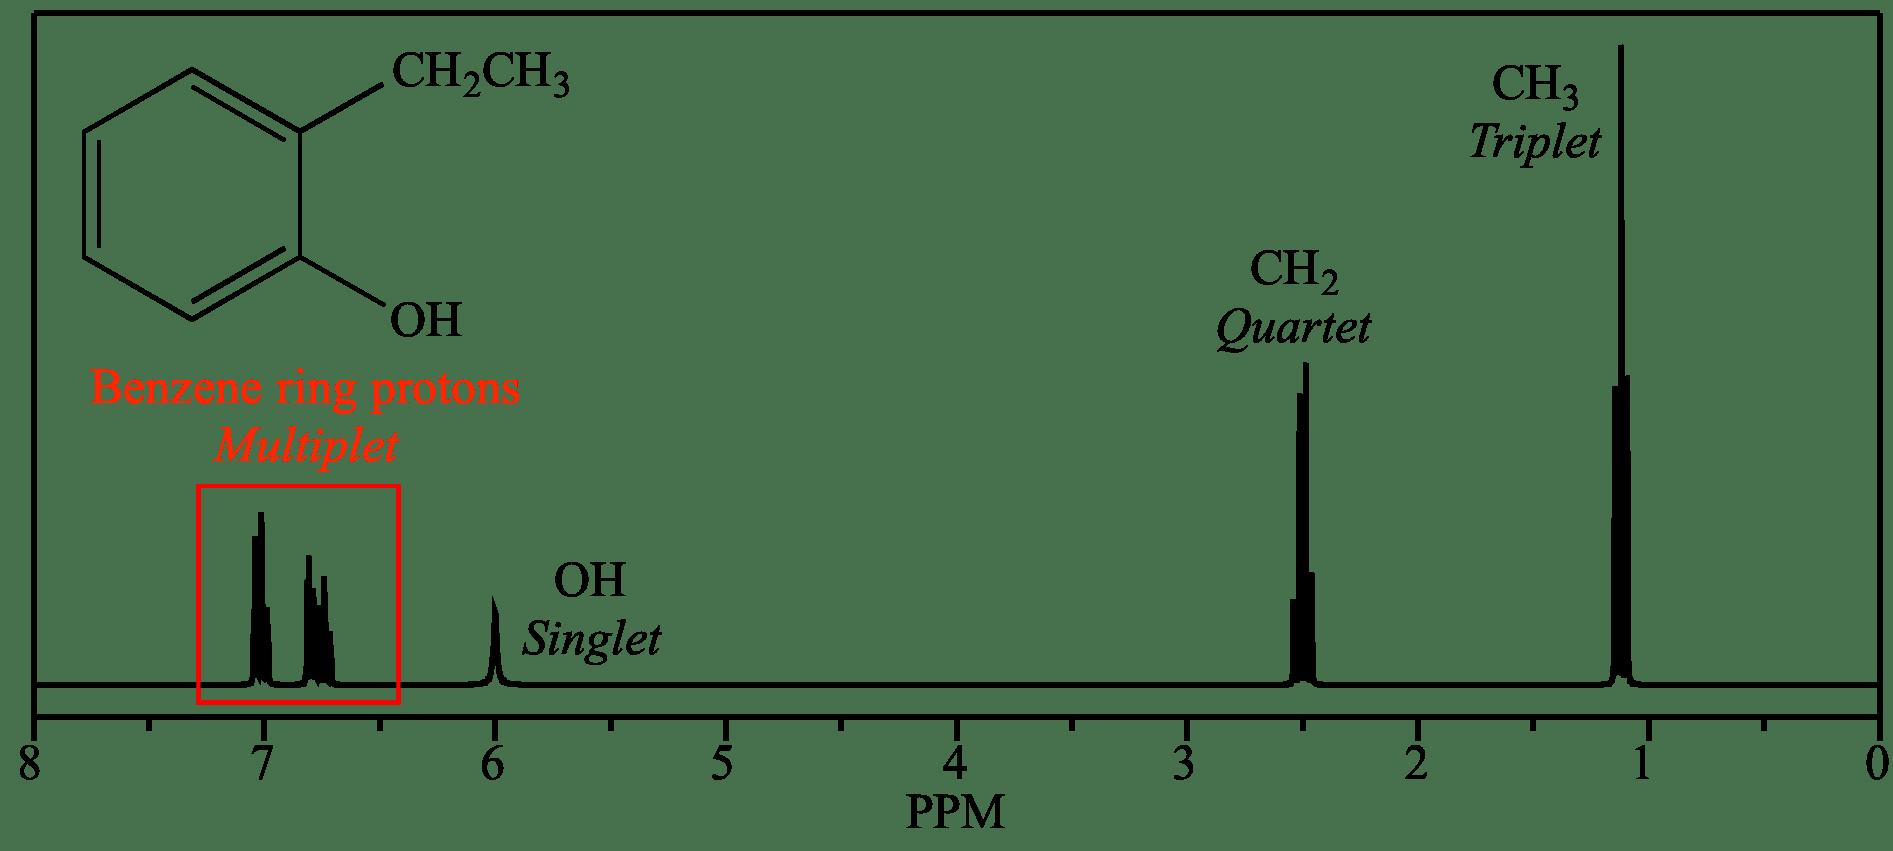 Sharp H1 Ppm Nmr Peak 5 6